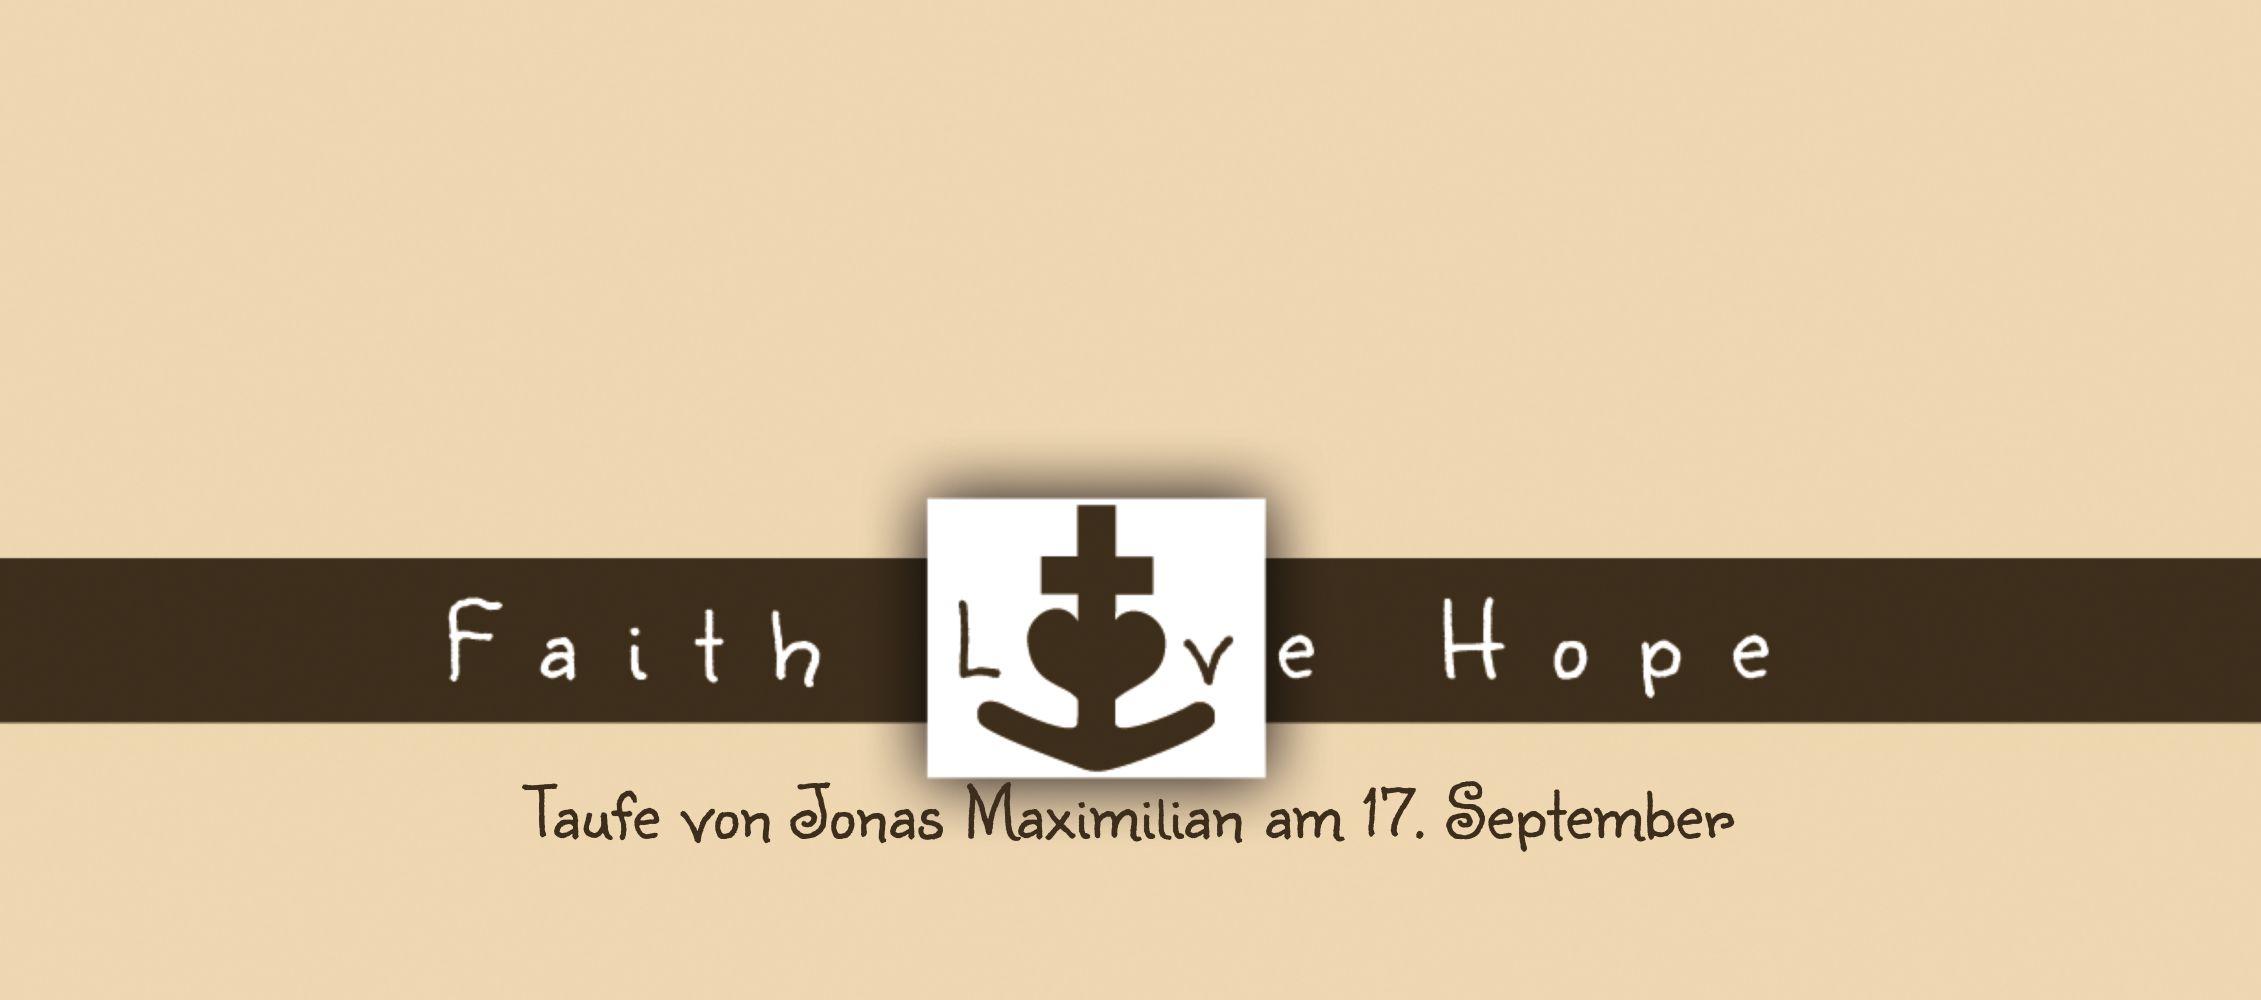 Ansicht 3 - Taufe Tischkarte faith love hope